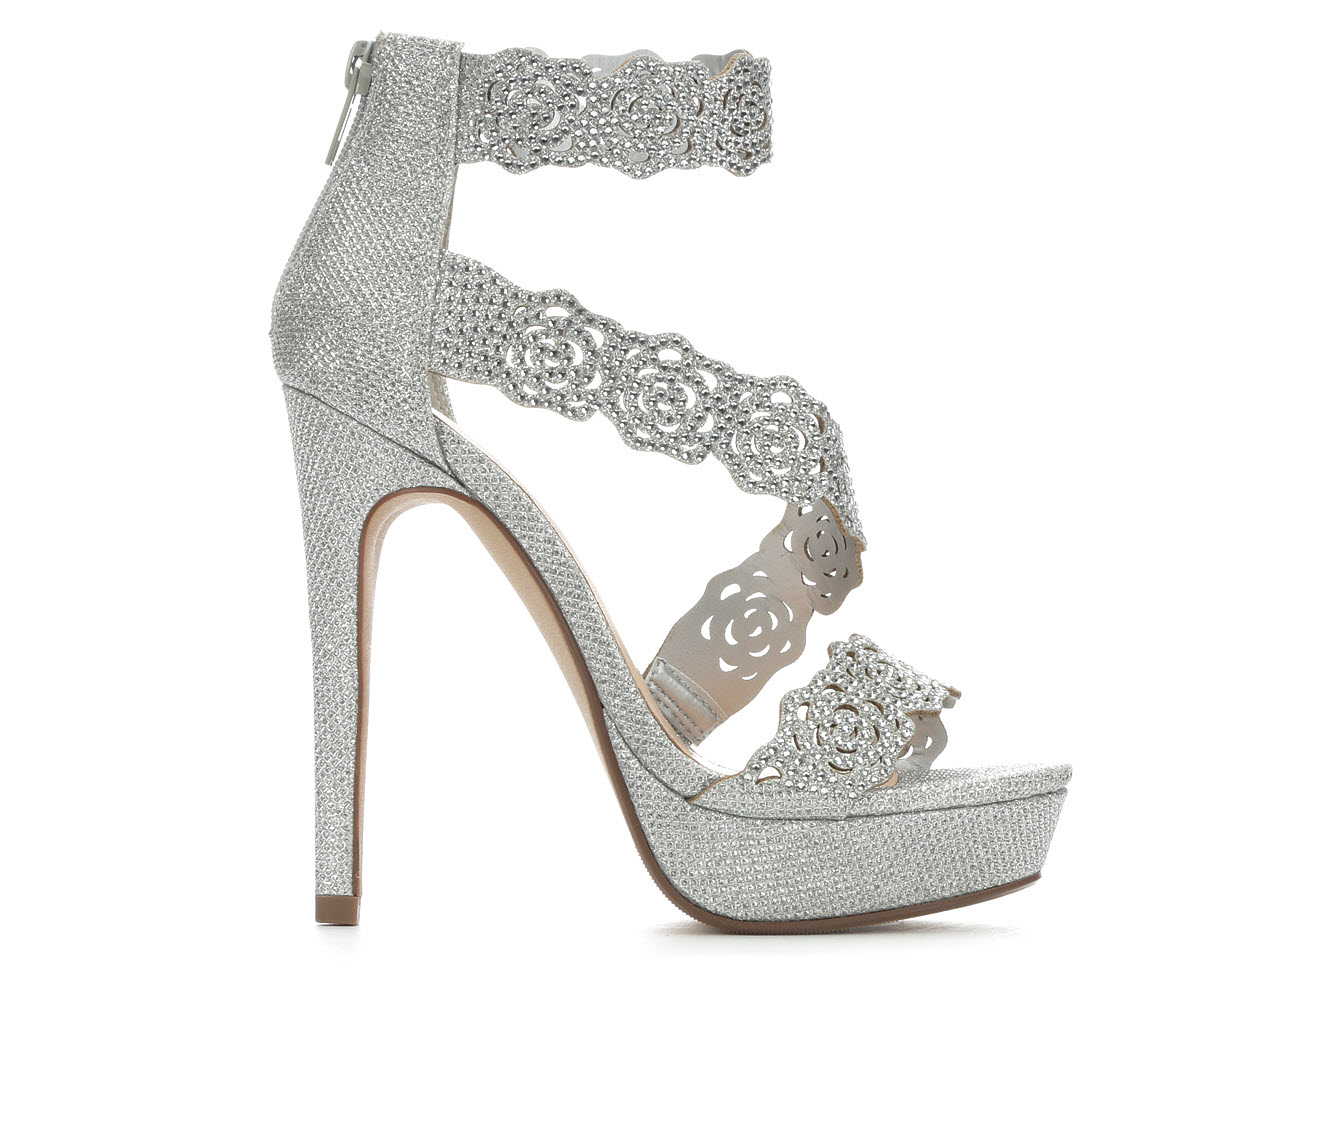 Delicious Yodels Women's Dress Shoe (Silver Faux Leather)